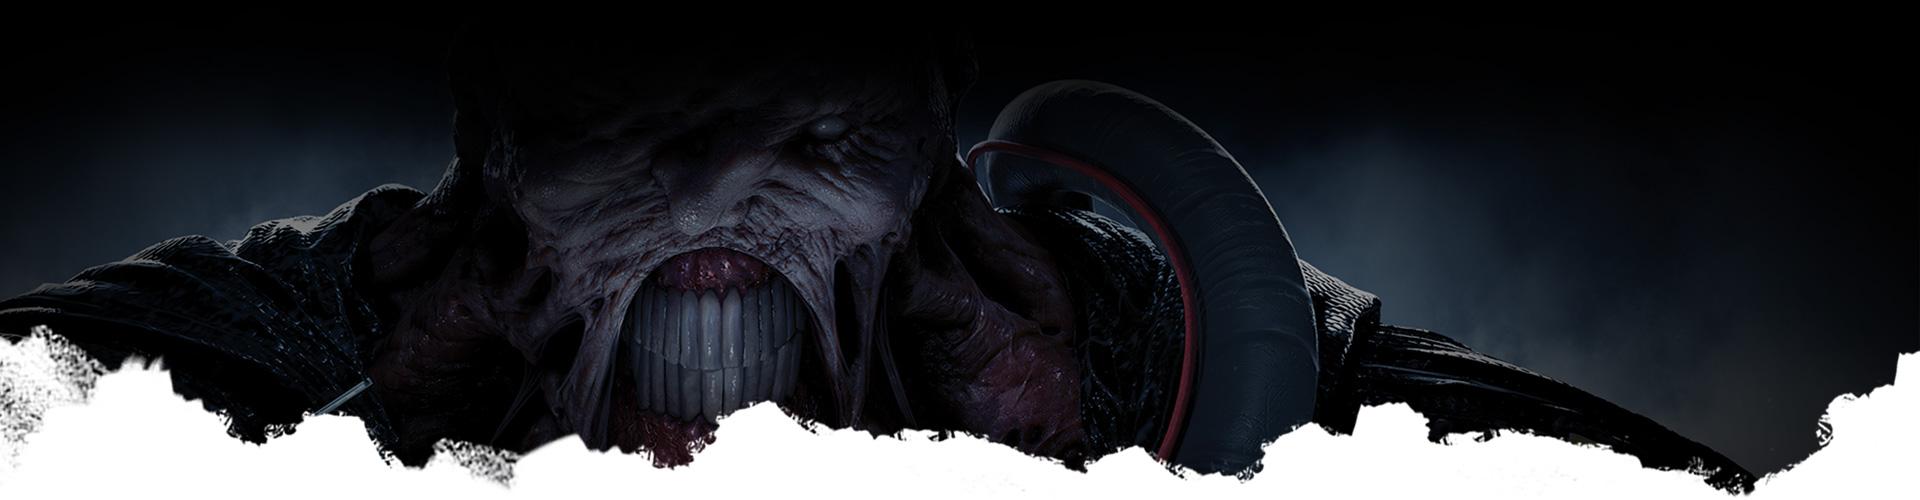 Nemesis' menacing face